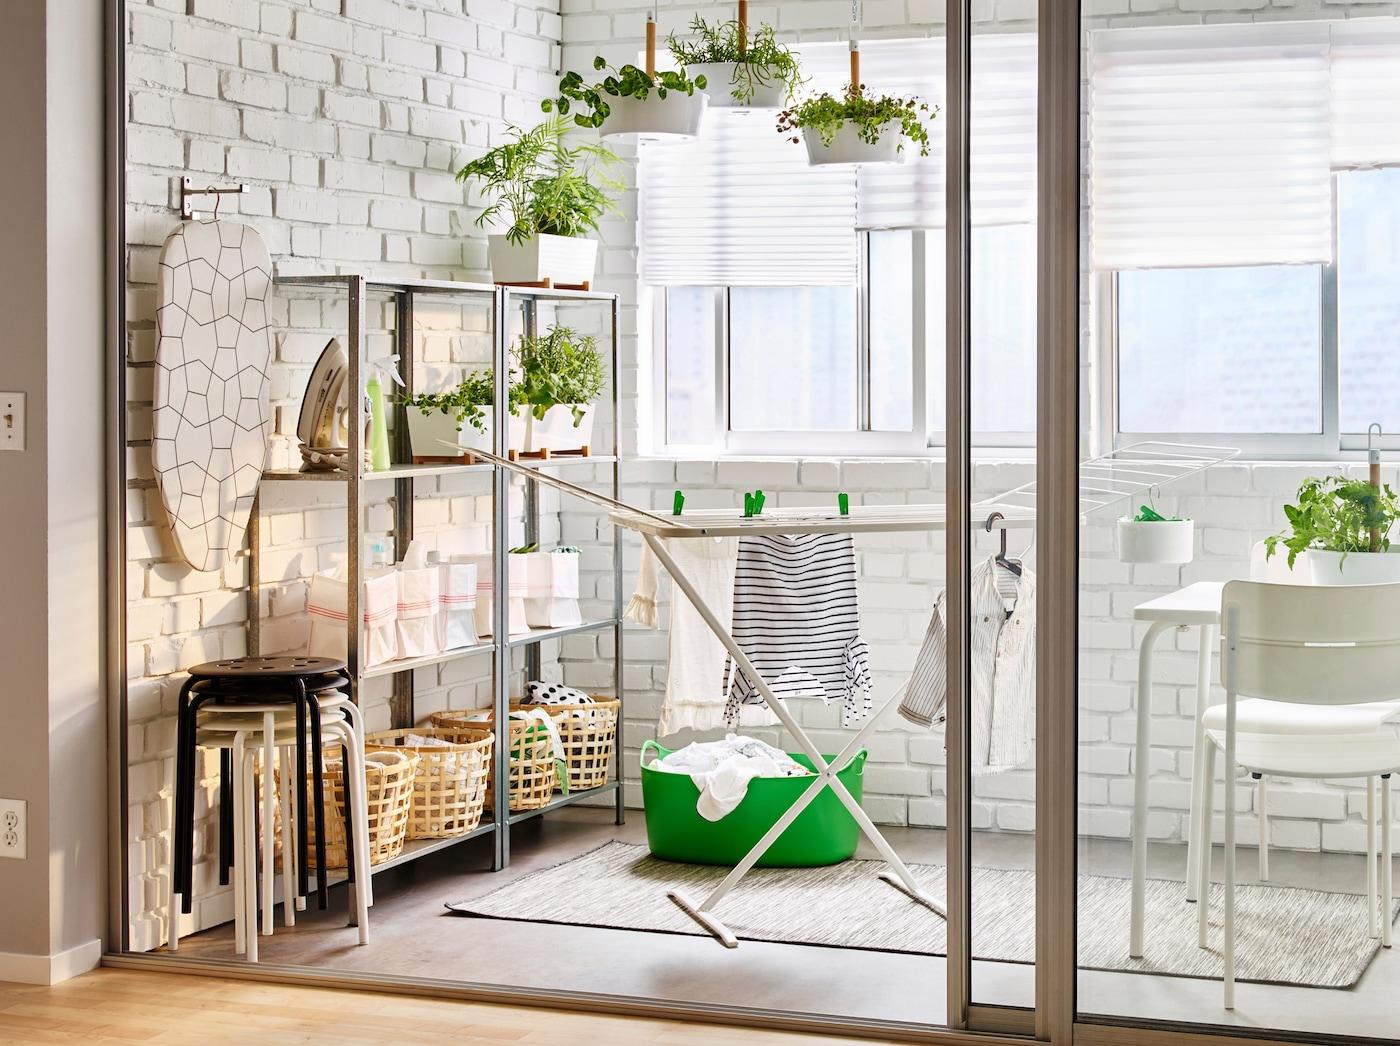 Balkon met stellingkasten in verzinkt staal en wit vlinderdroogrek